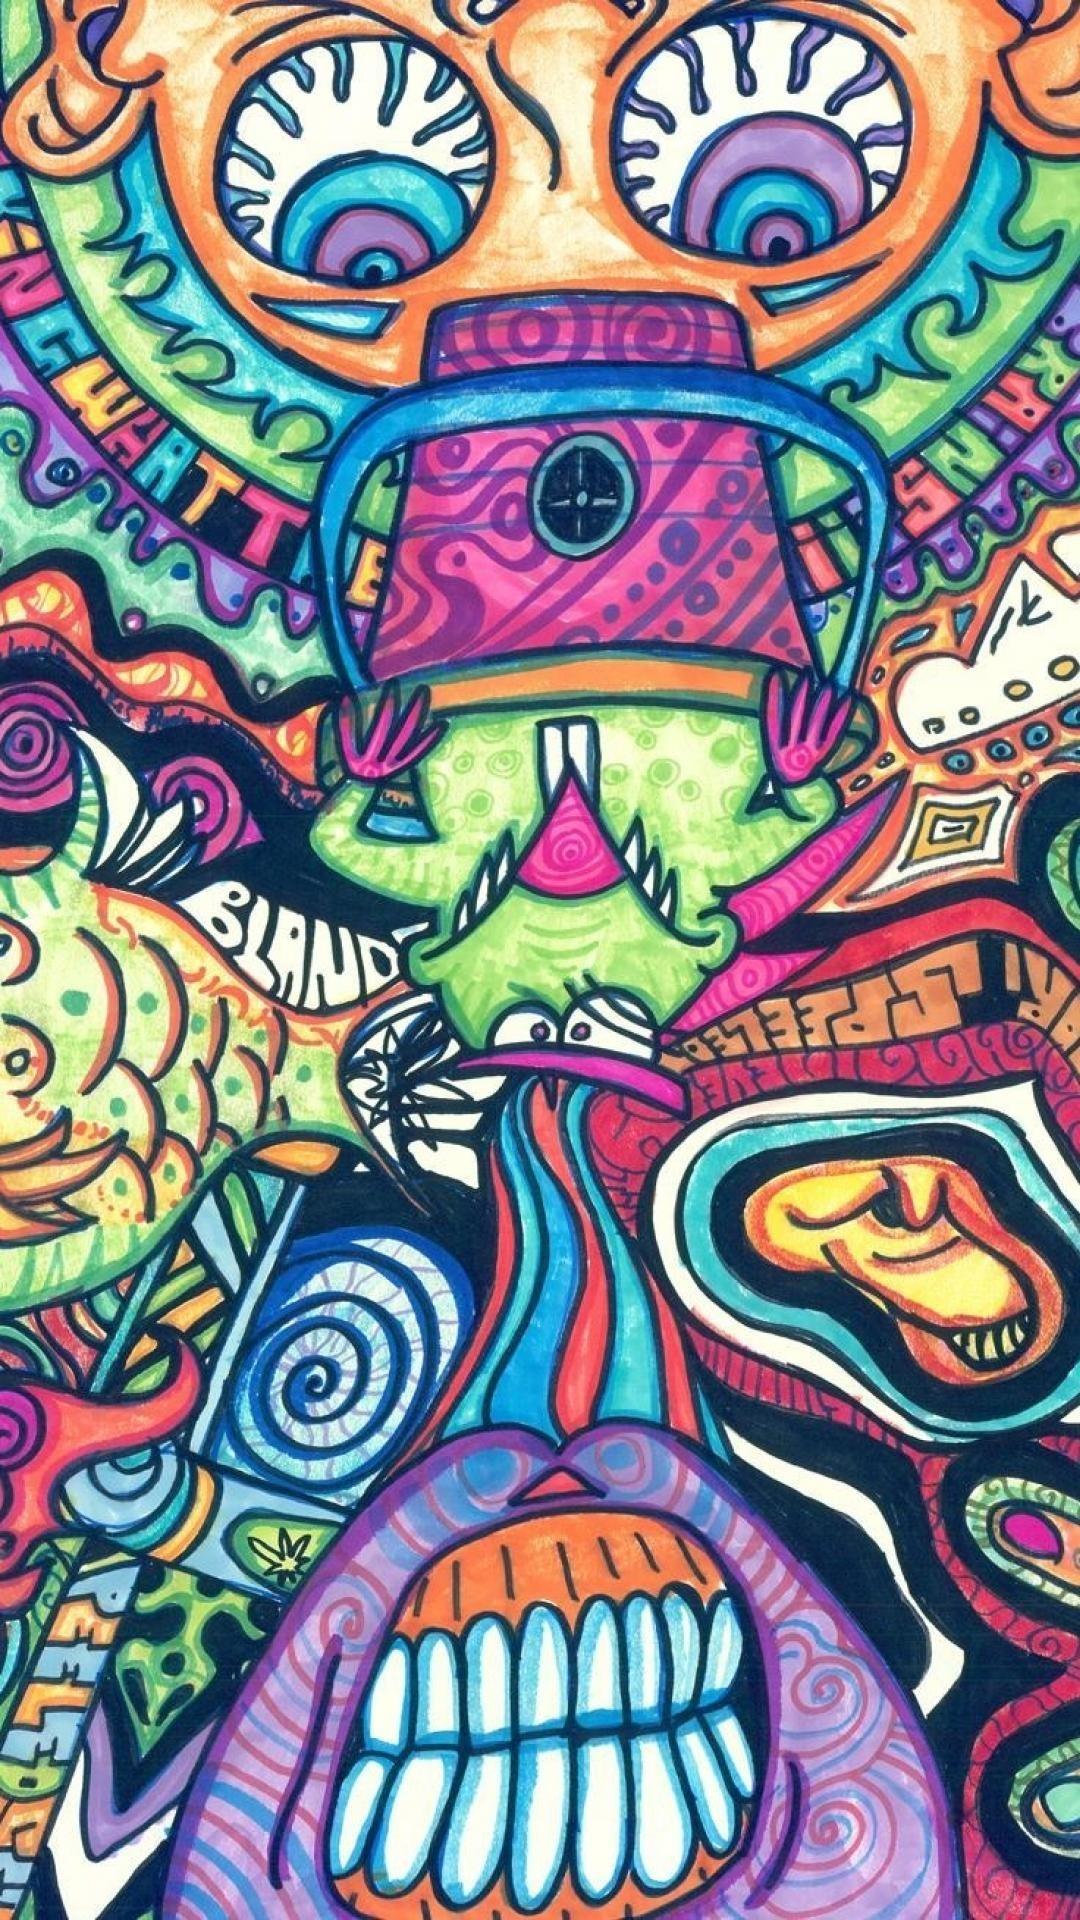 Trippy Stoner Wallpaper Posted By Sarah Mercado